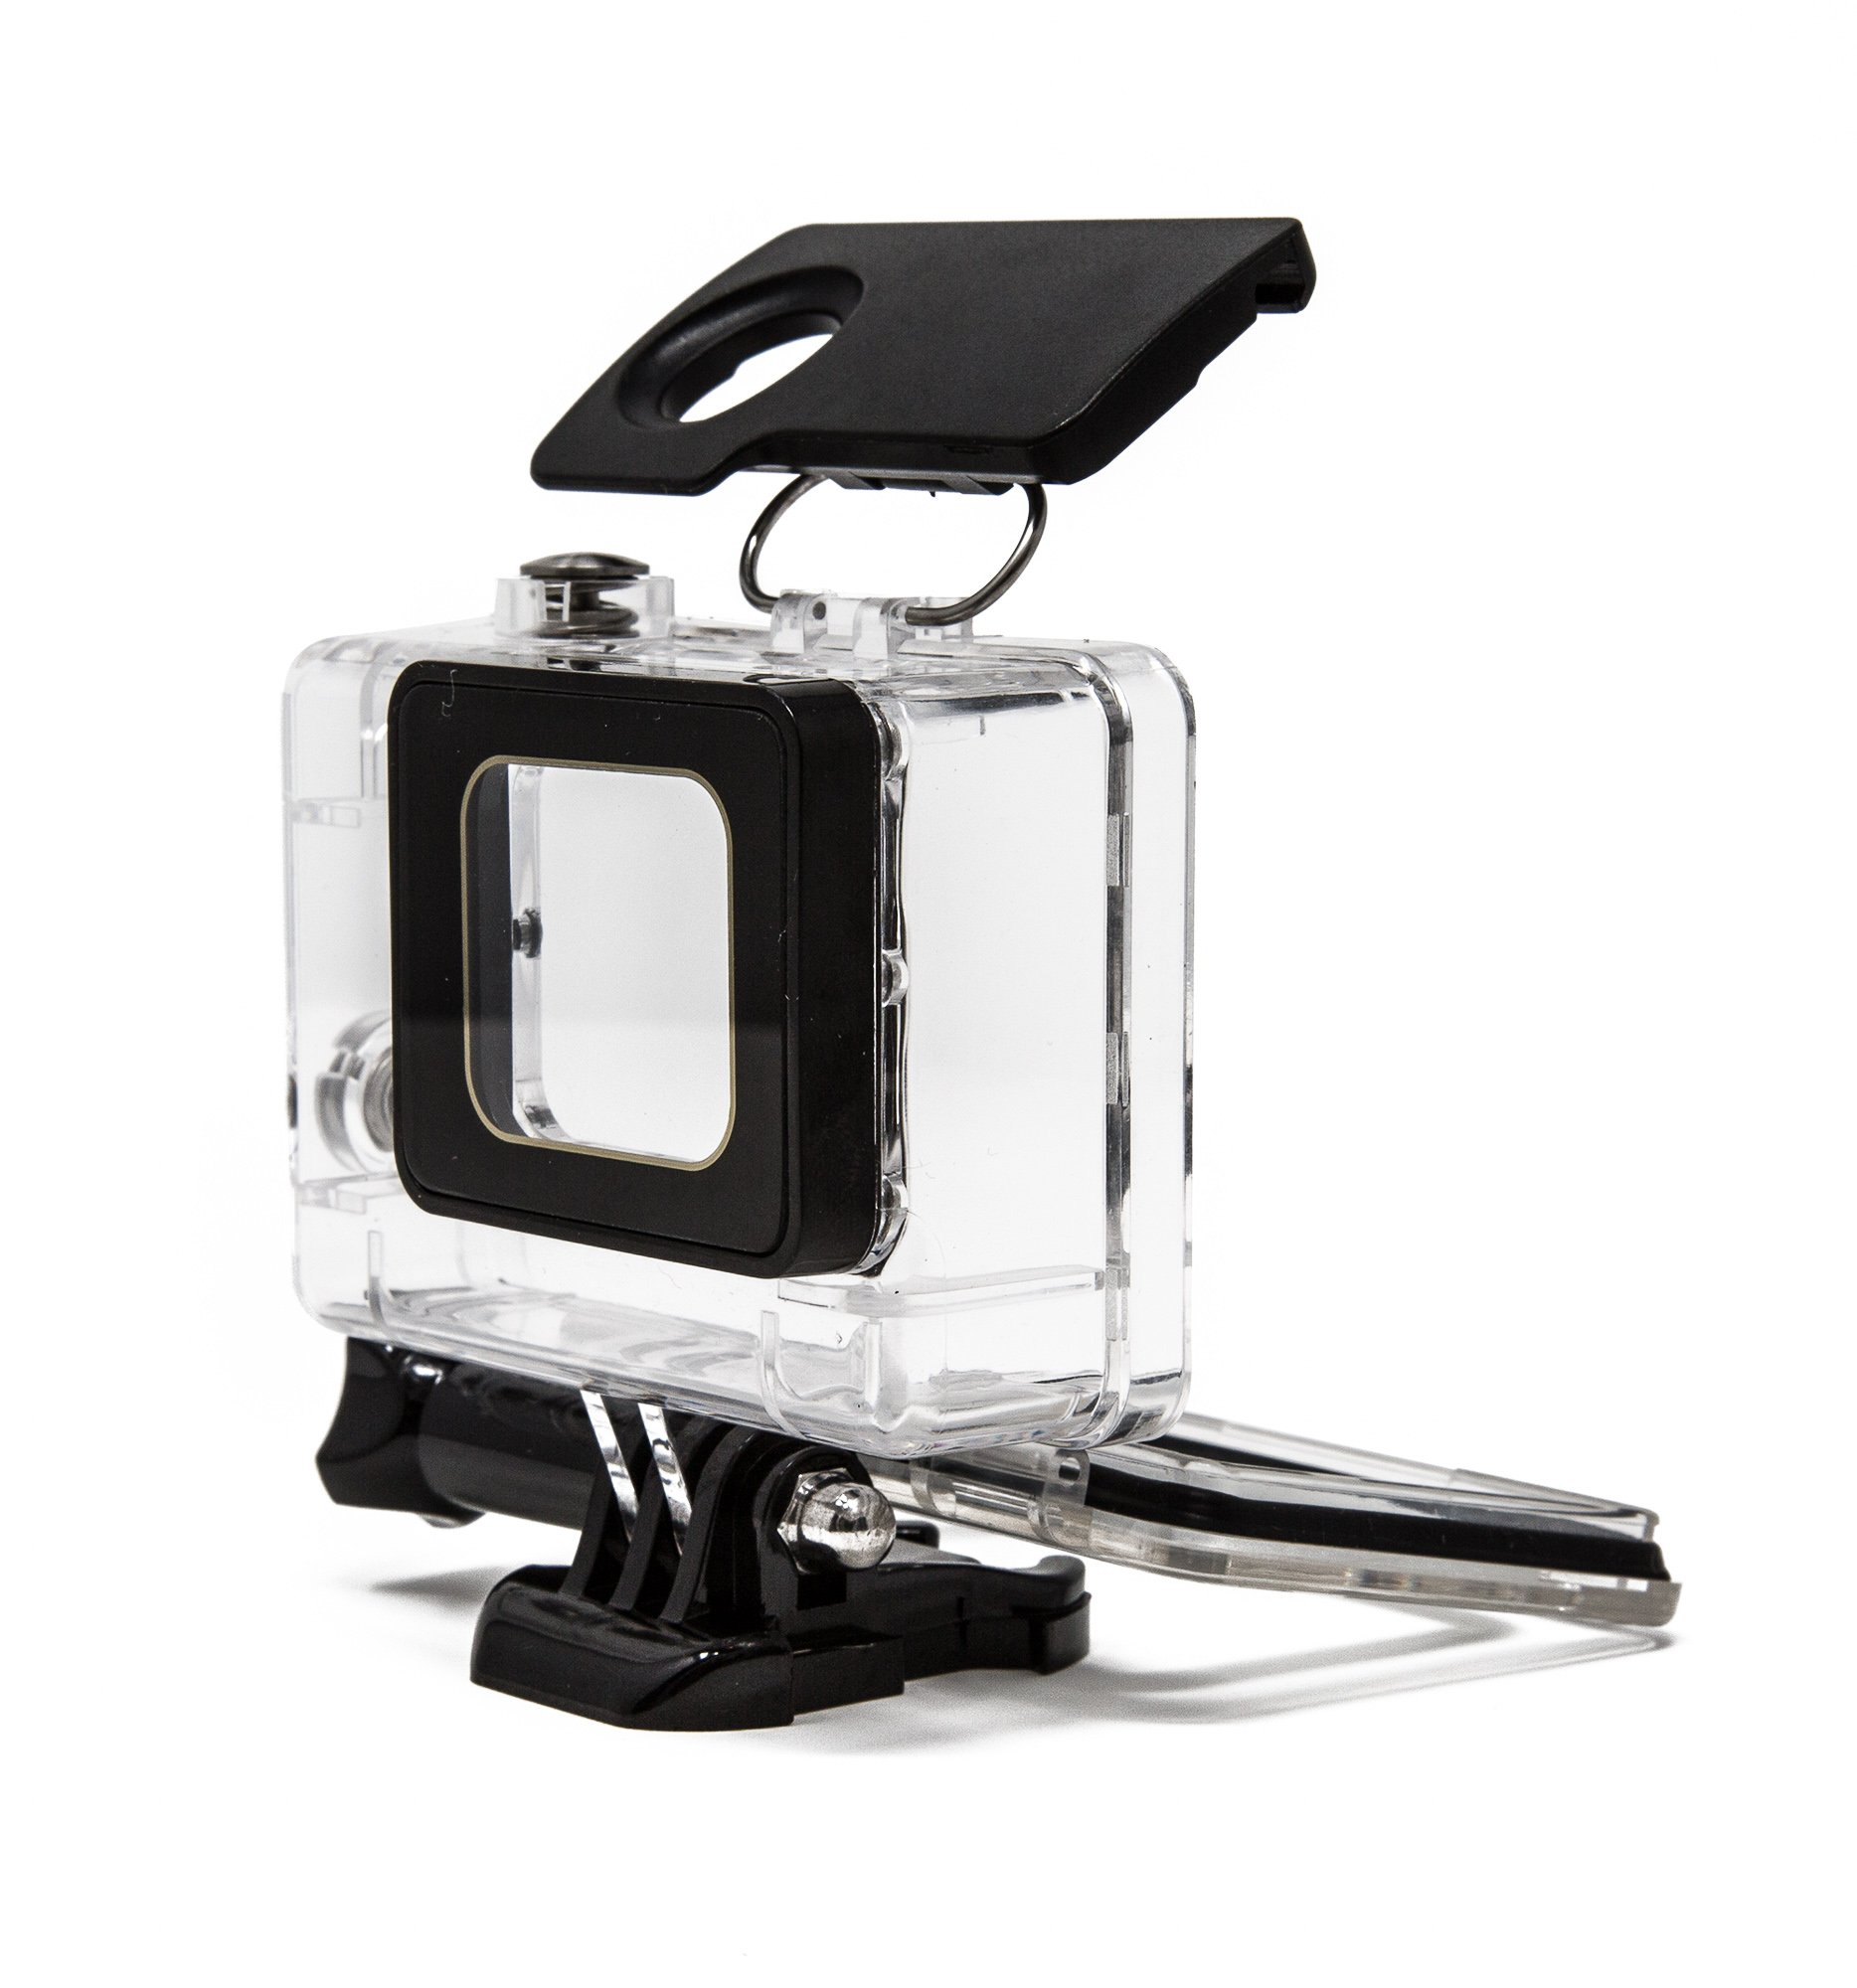 SSE (40m) Waterproof Housing Transparent Protective Case For GoPro HERO5/HERO6